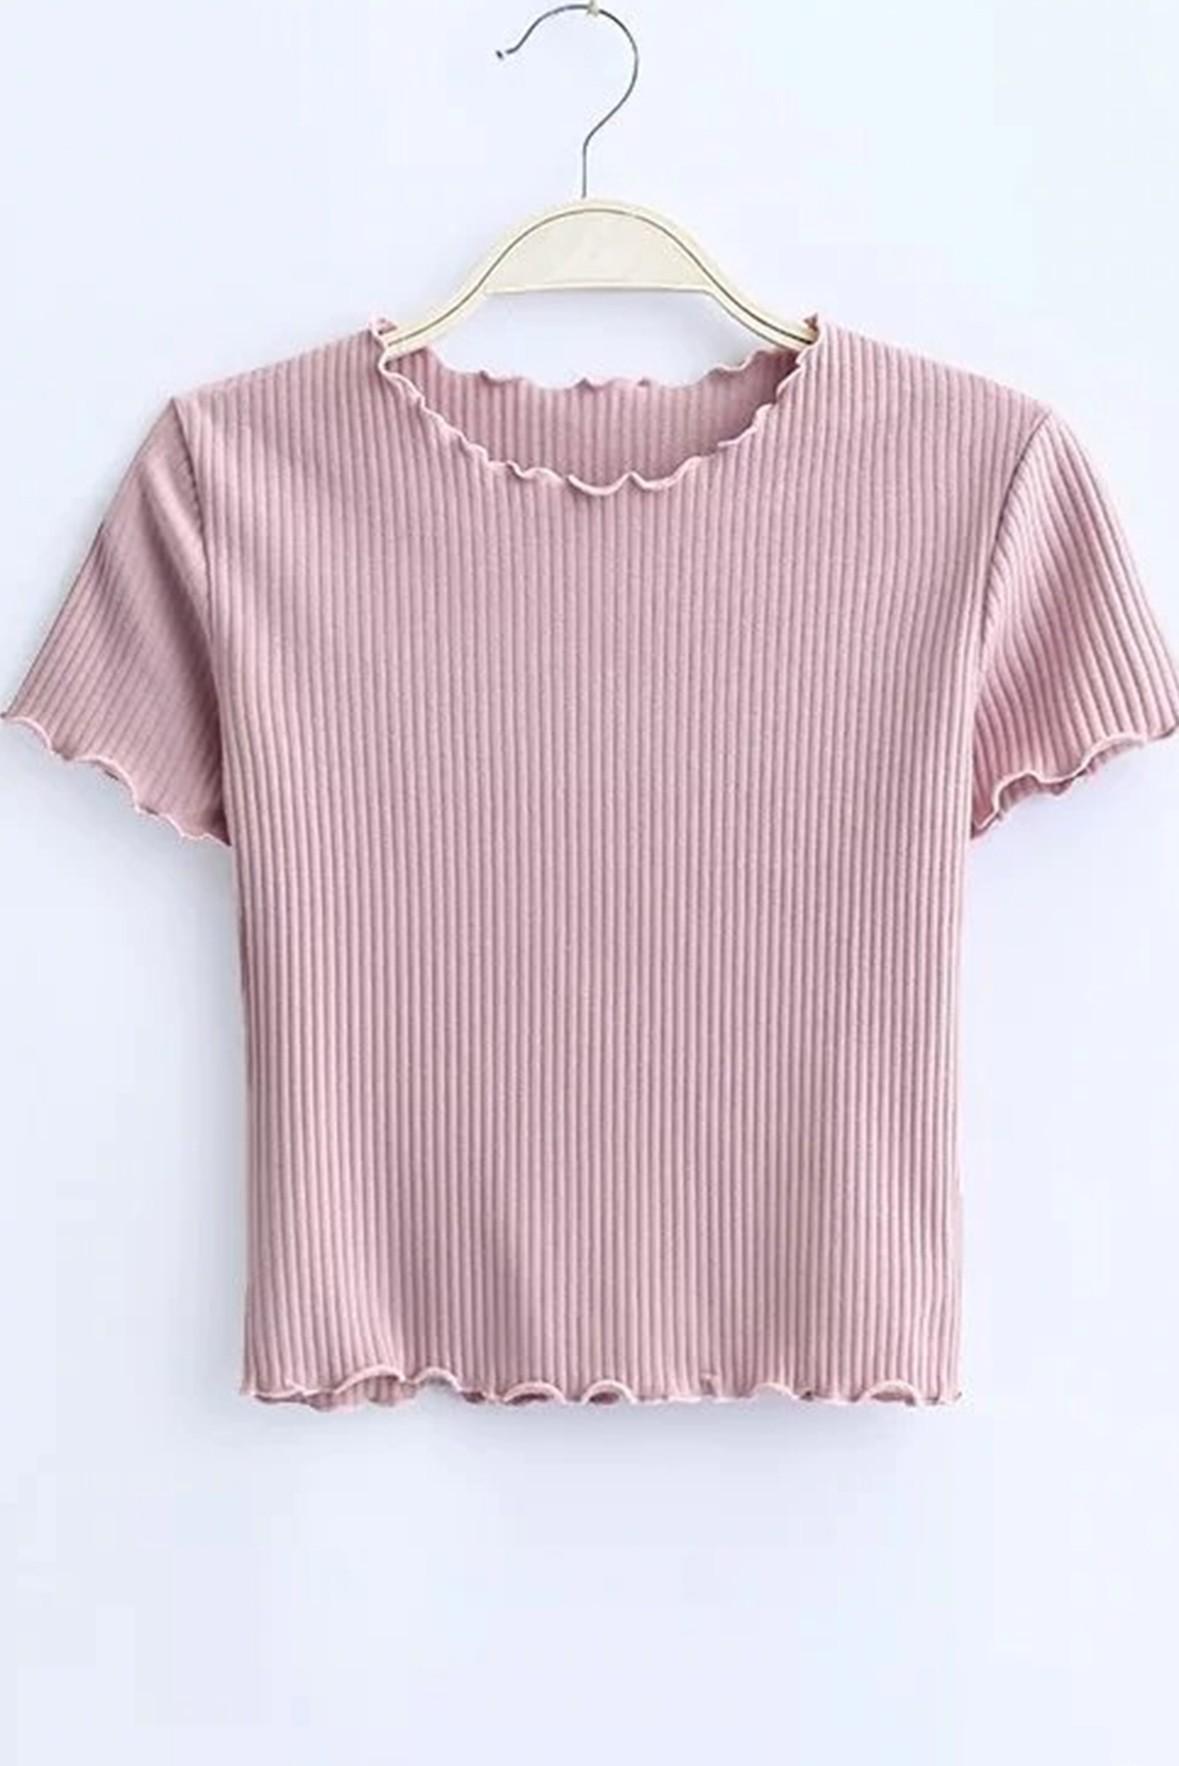 Pink round neck rib top